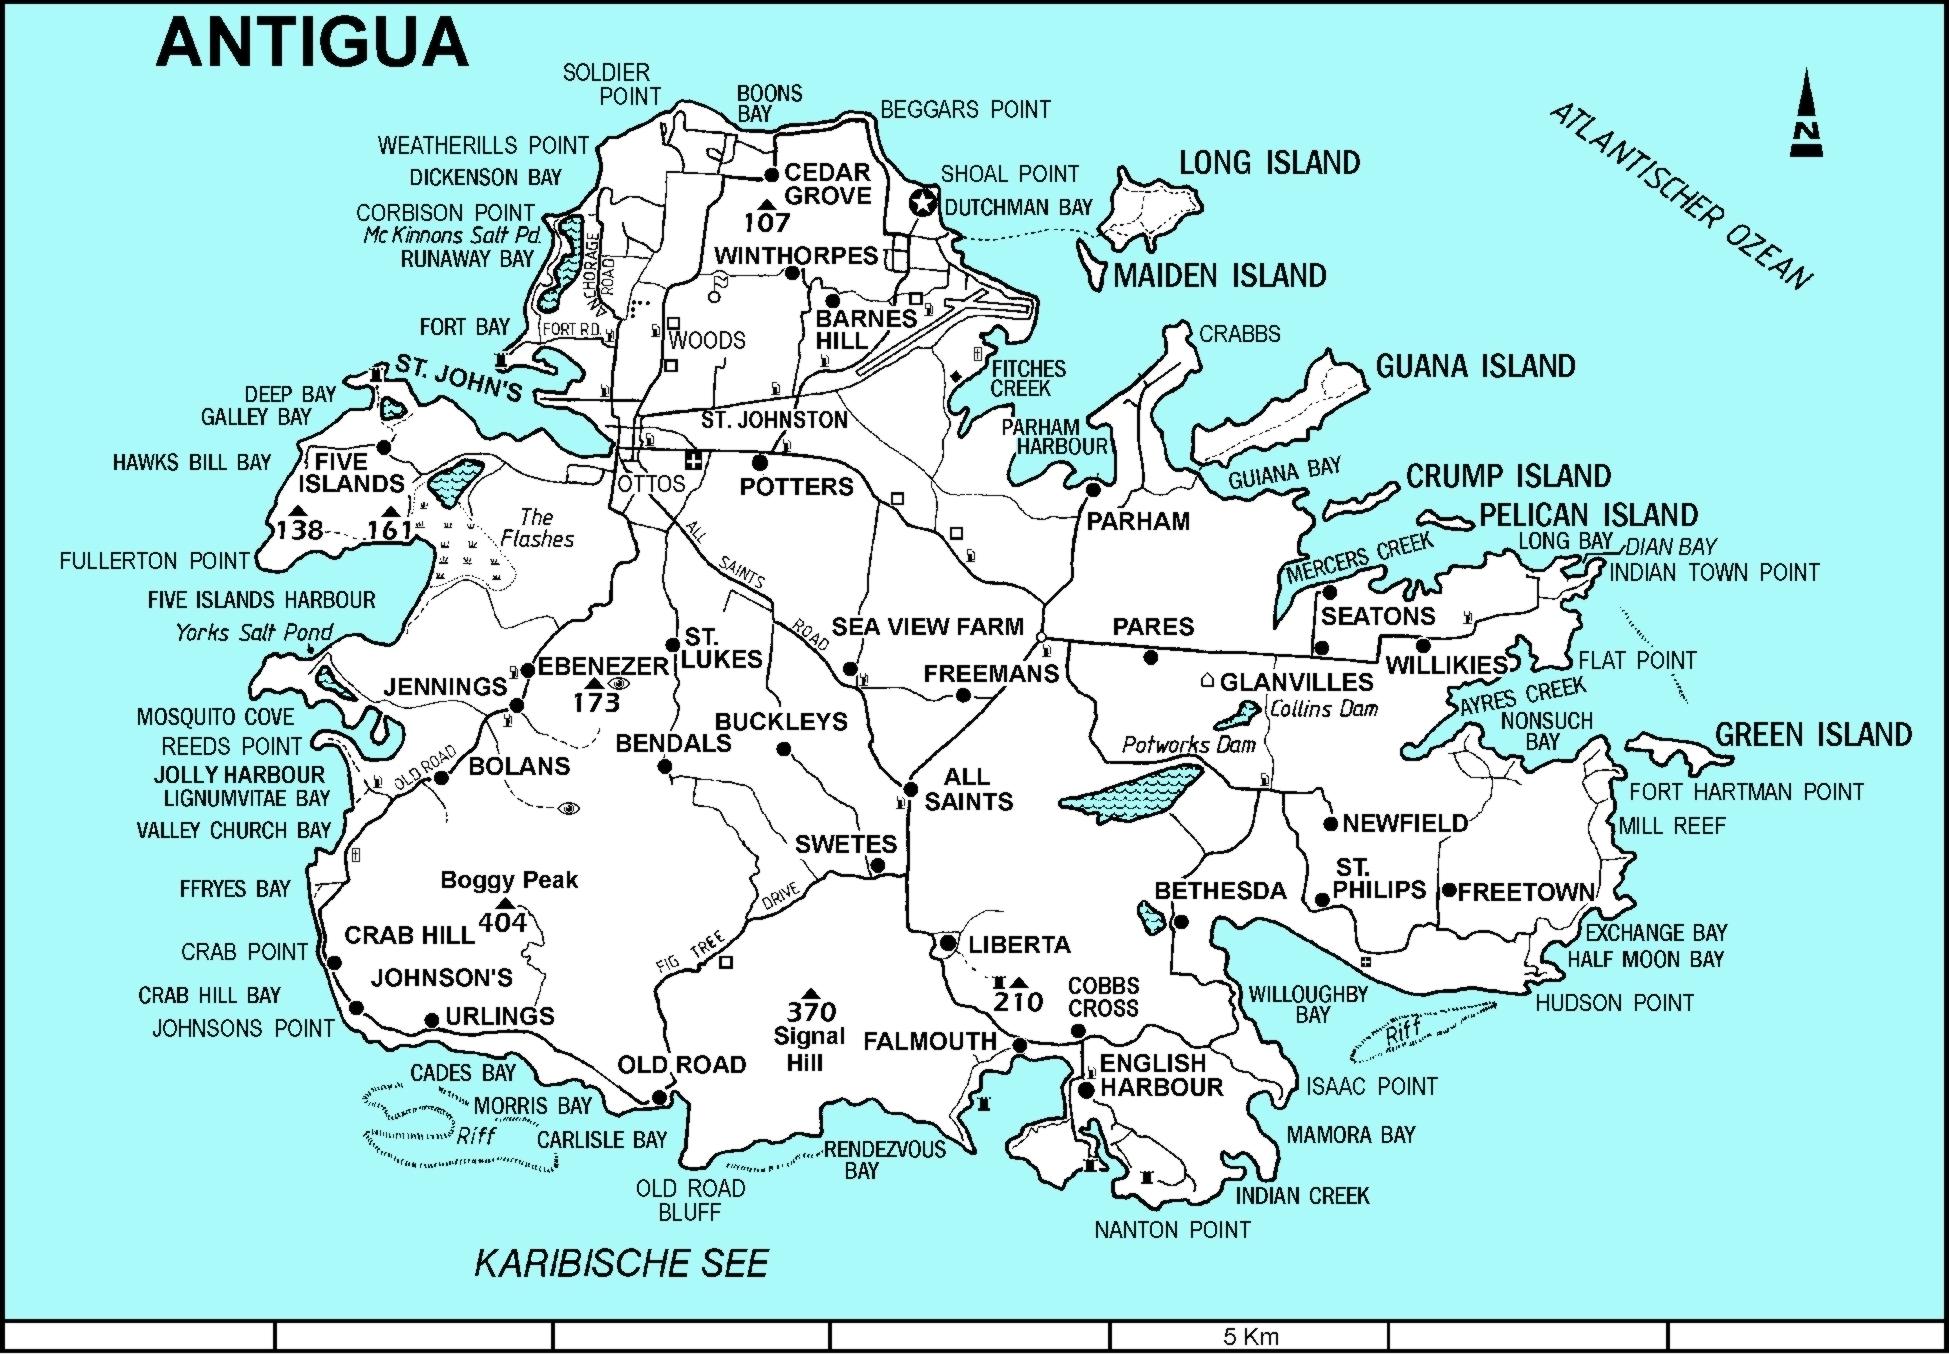 fileantigua map  wikimedia commons - fileantigua map